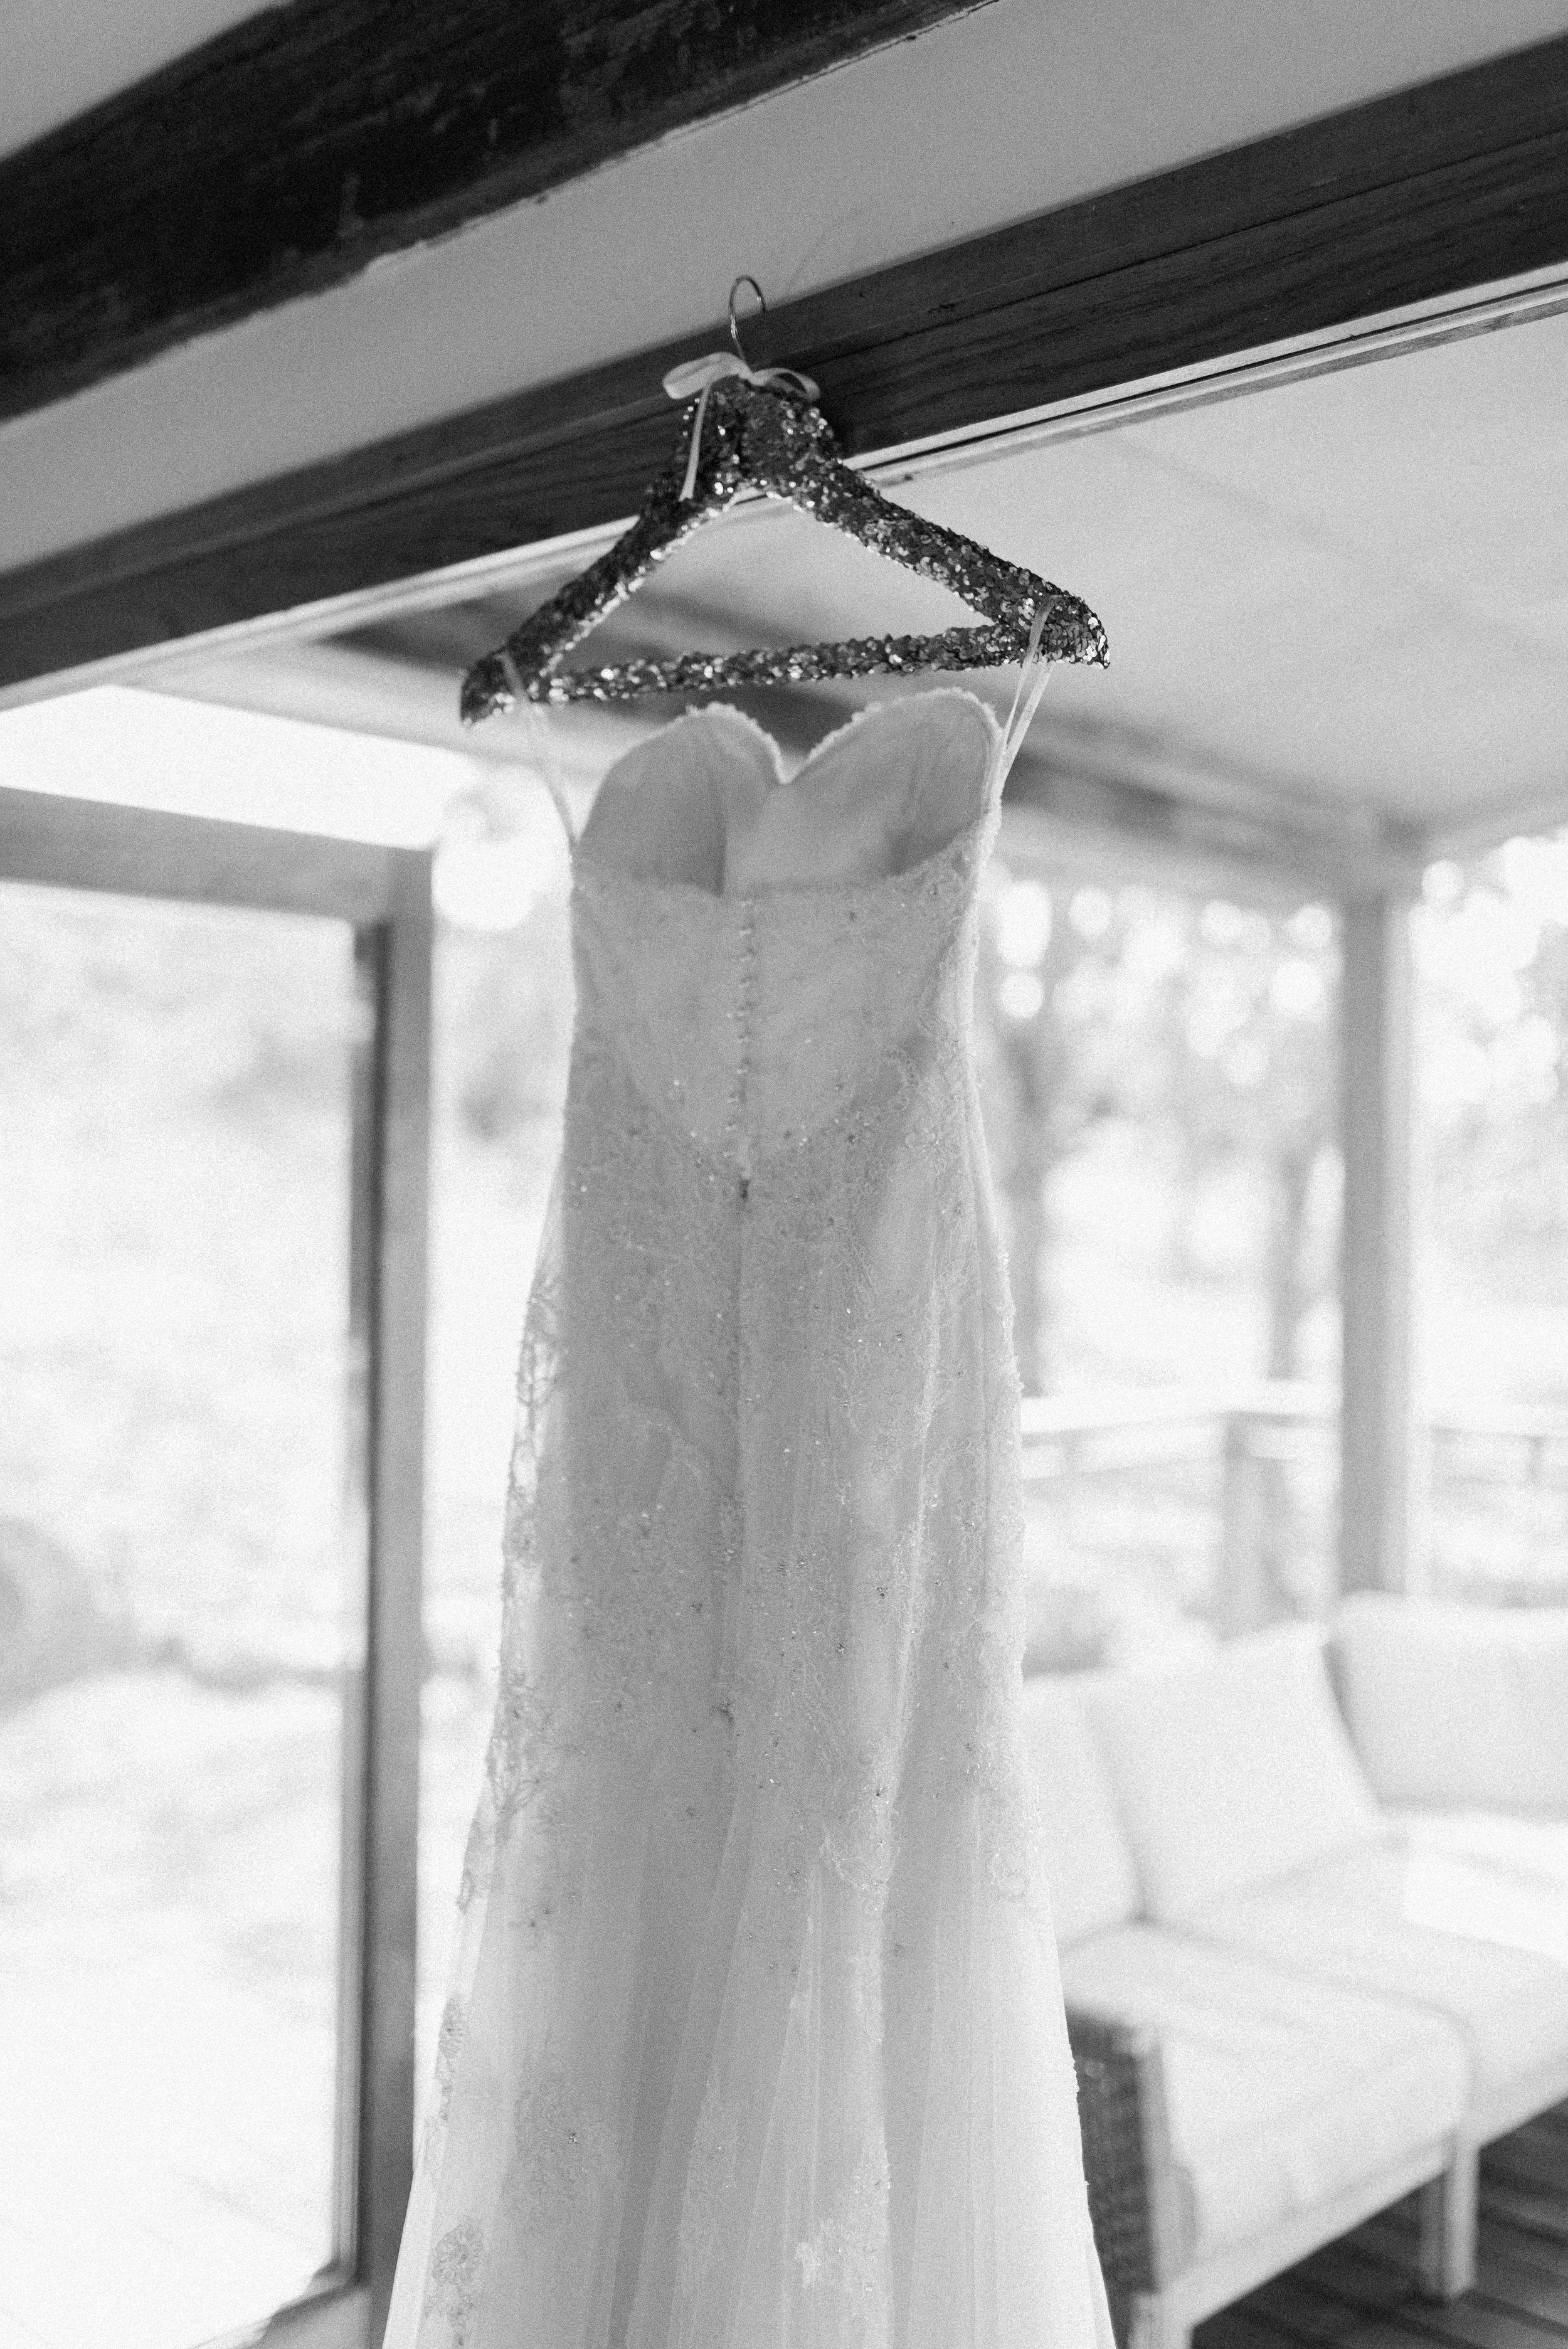 Kooroomba-Vineyard-Lavender-Farm-Wedding-Fine-Art-Lauren-Olivia-3.jpg